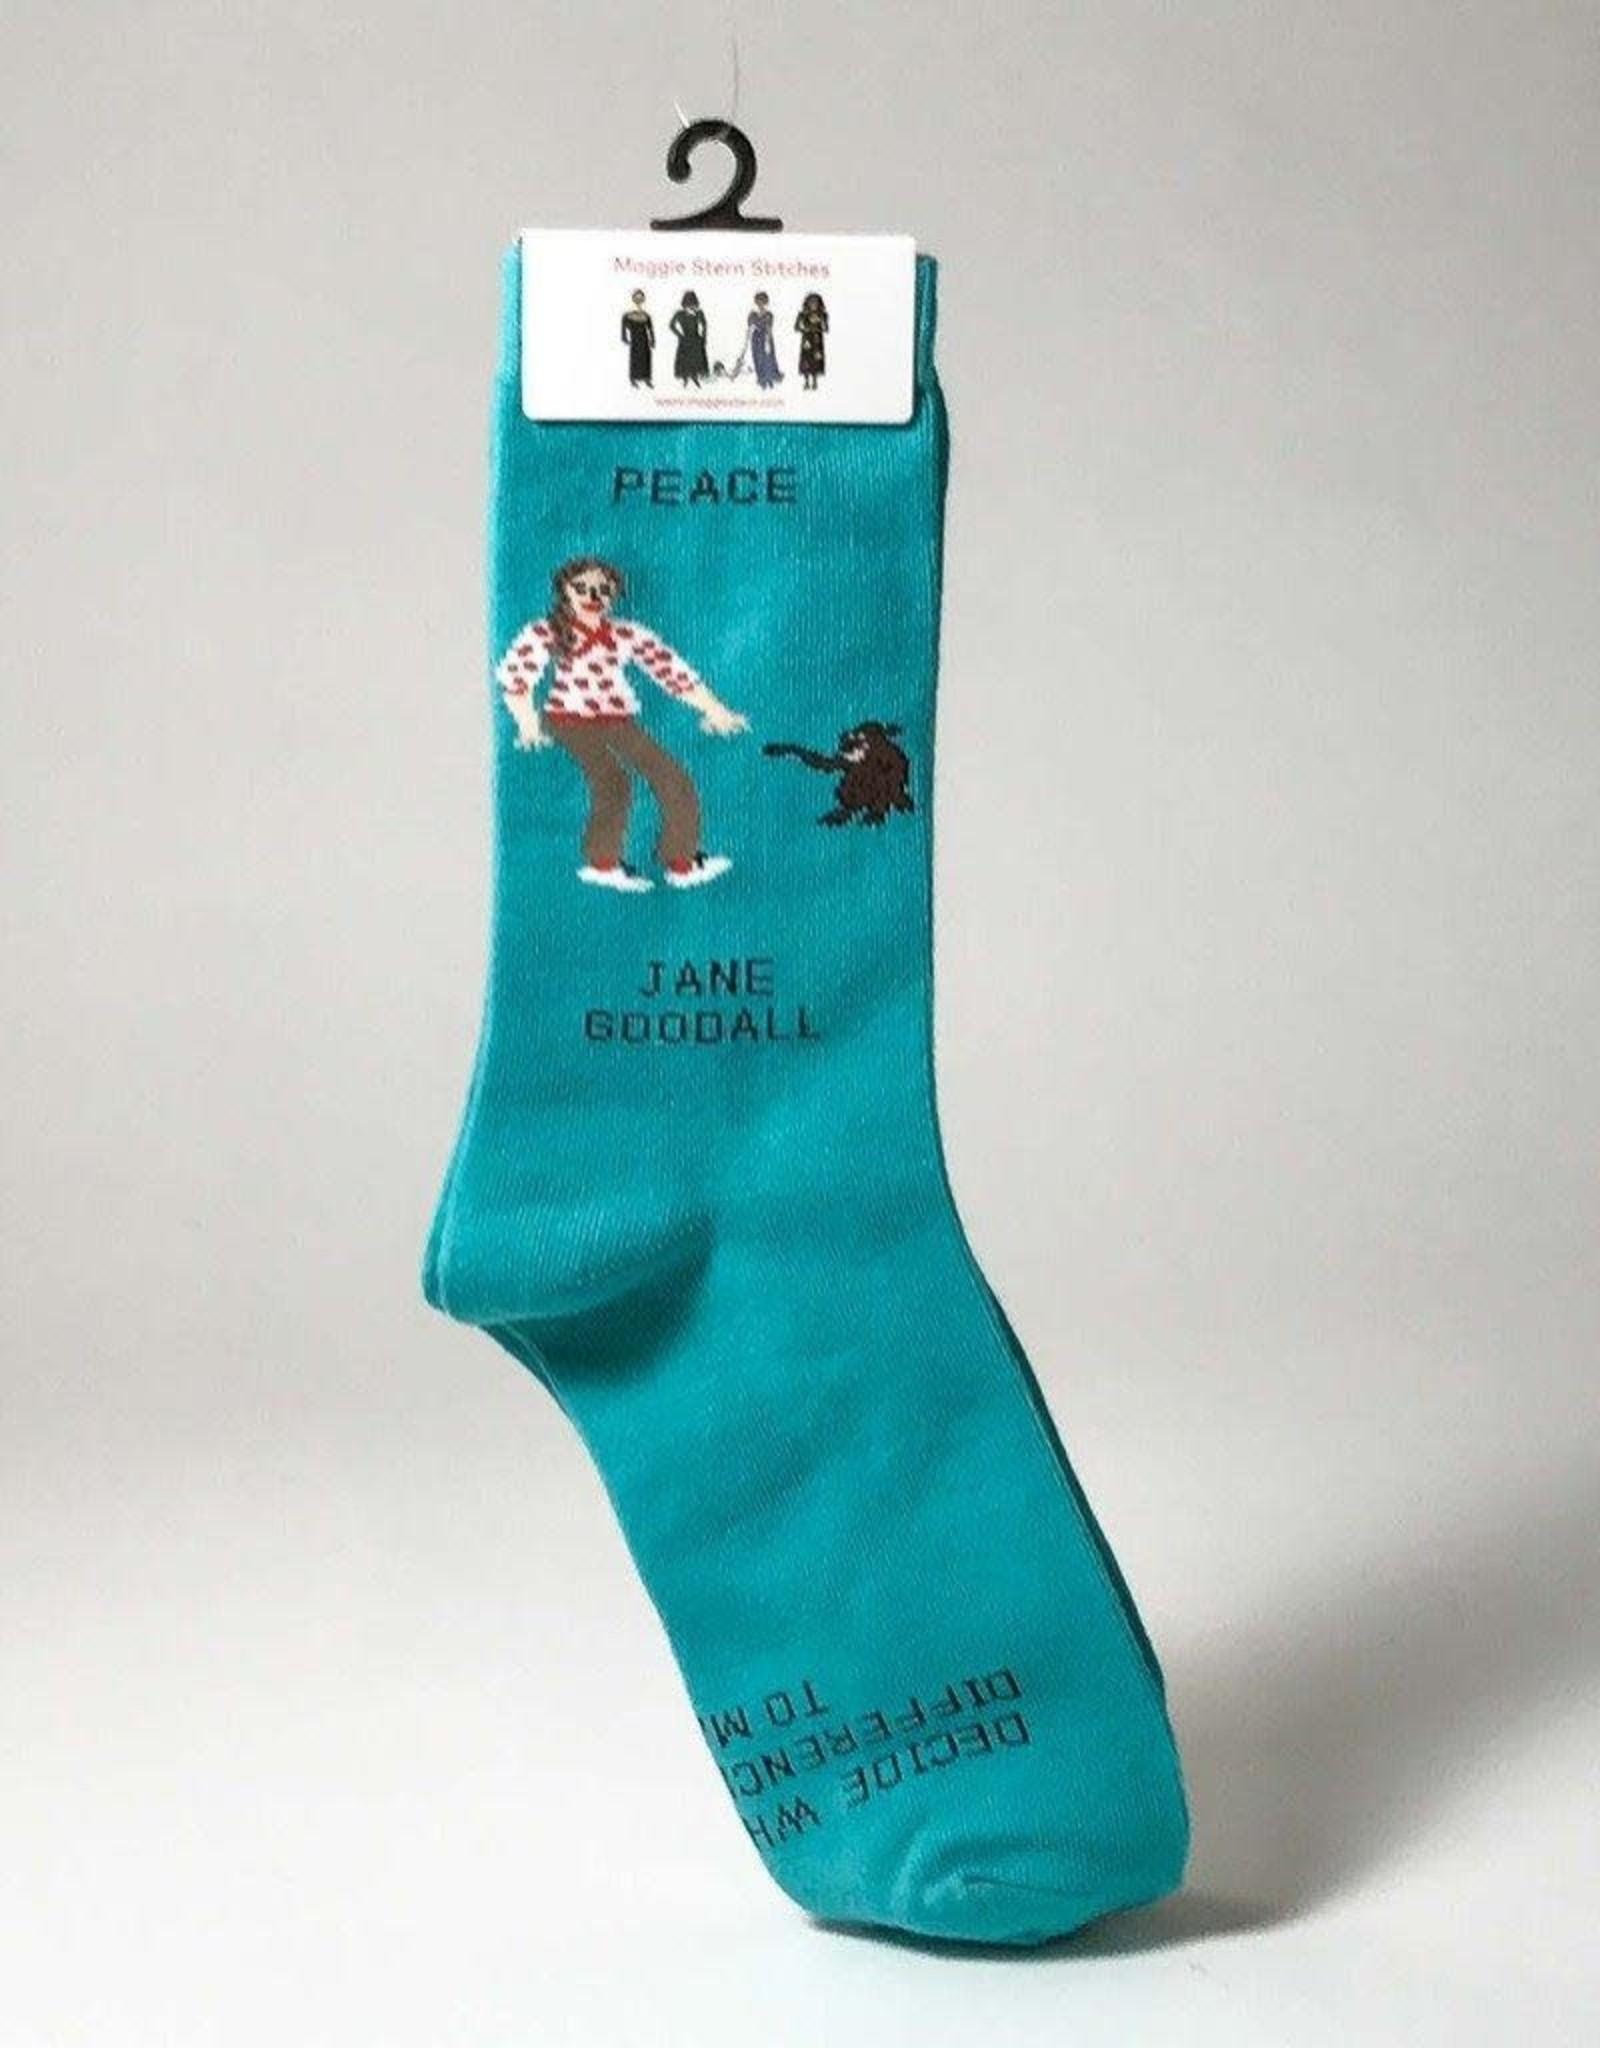 Maggie Stern Stitches Jane Goodall Women's Crew Socks